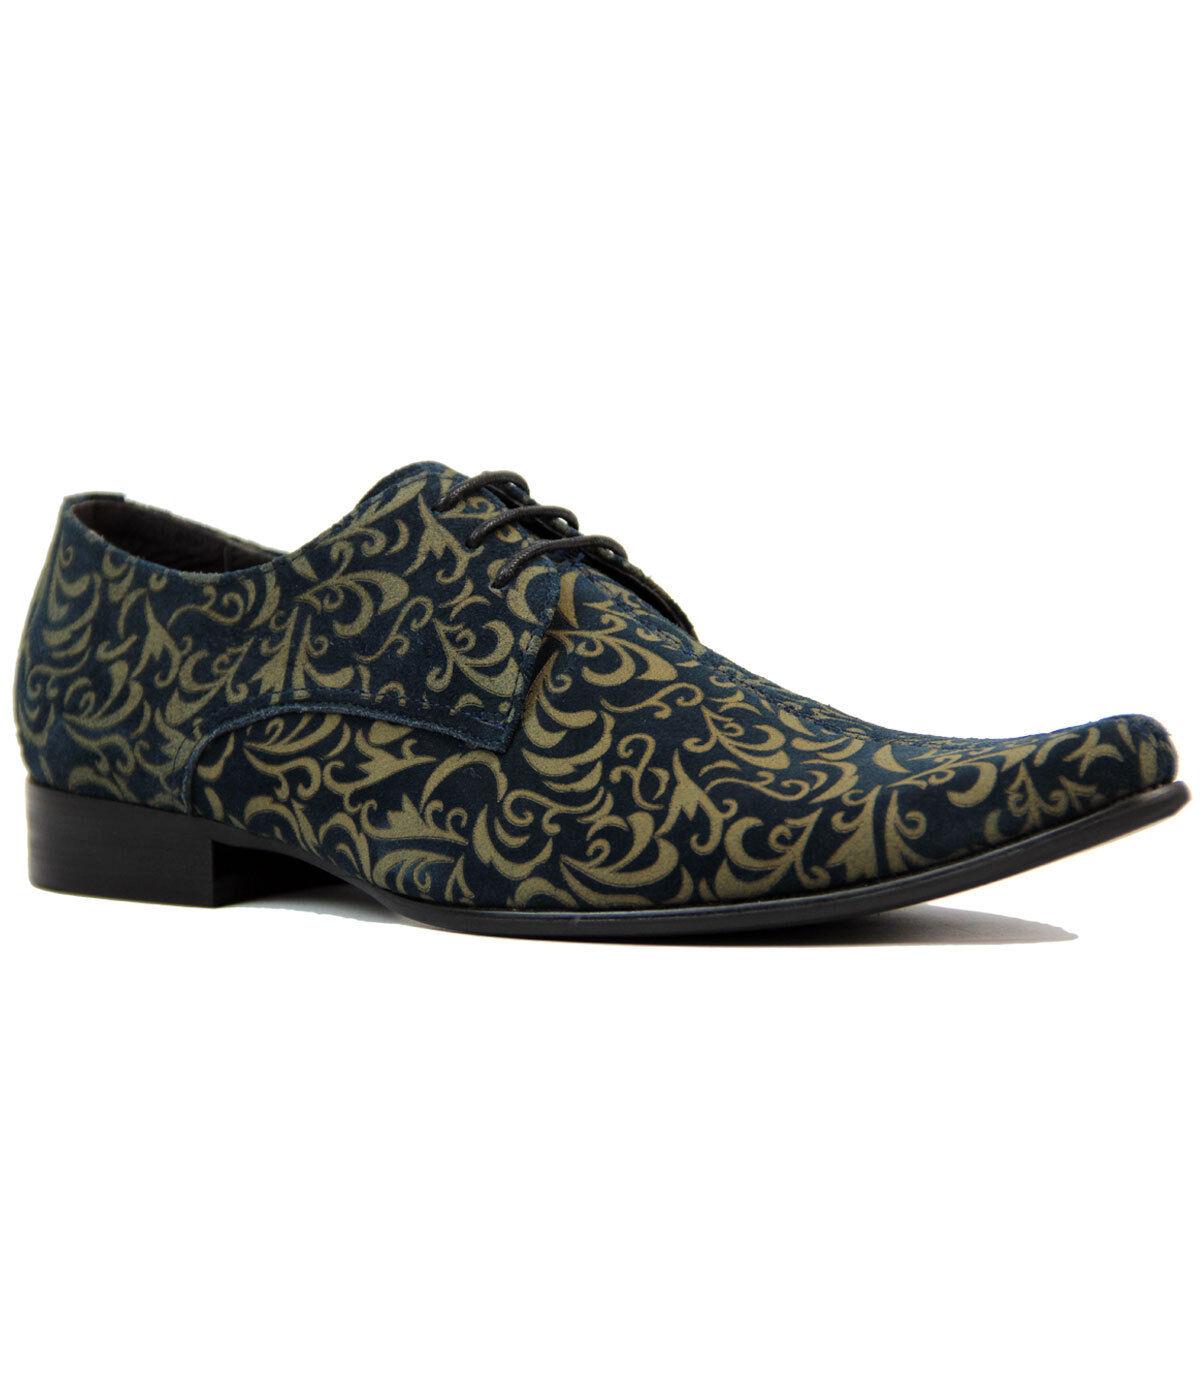 NUOVO Anni'60 MADCAP Mod Retro Mod Anni'60 NUOVO Paisley suede shoes Winklepickers 60s Jag Navy dccf3e